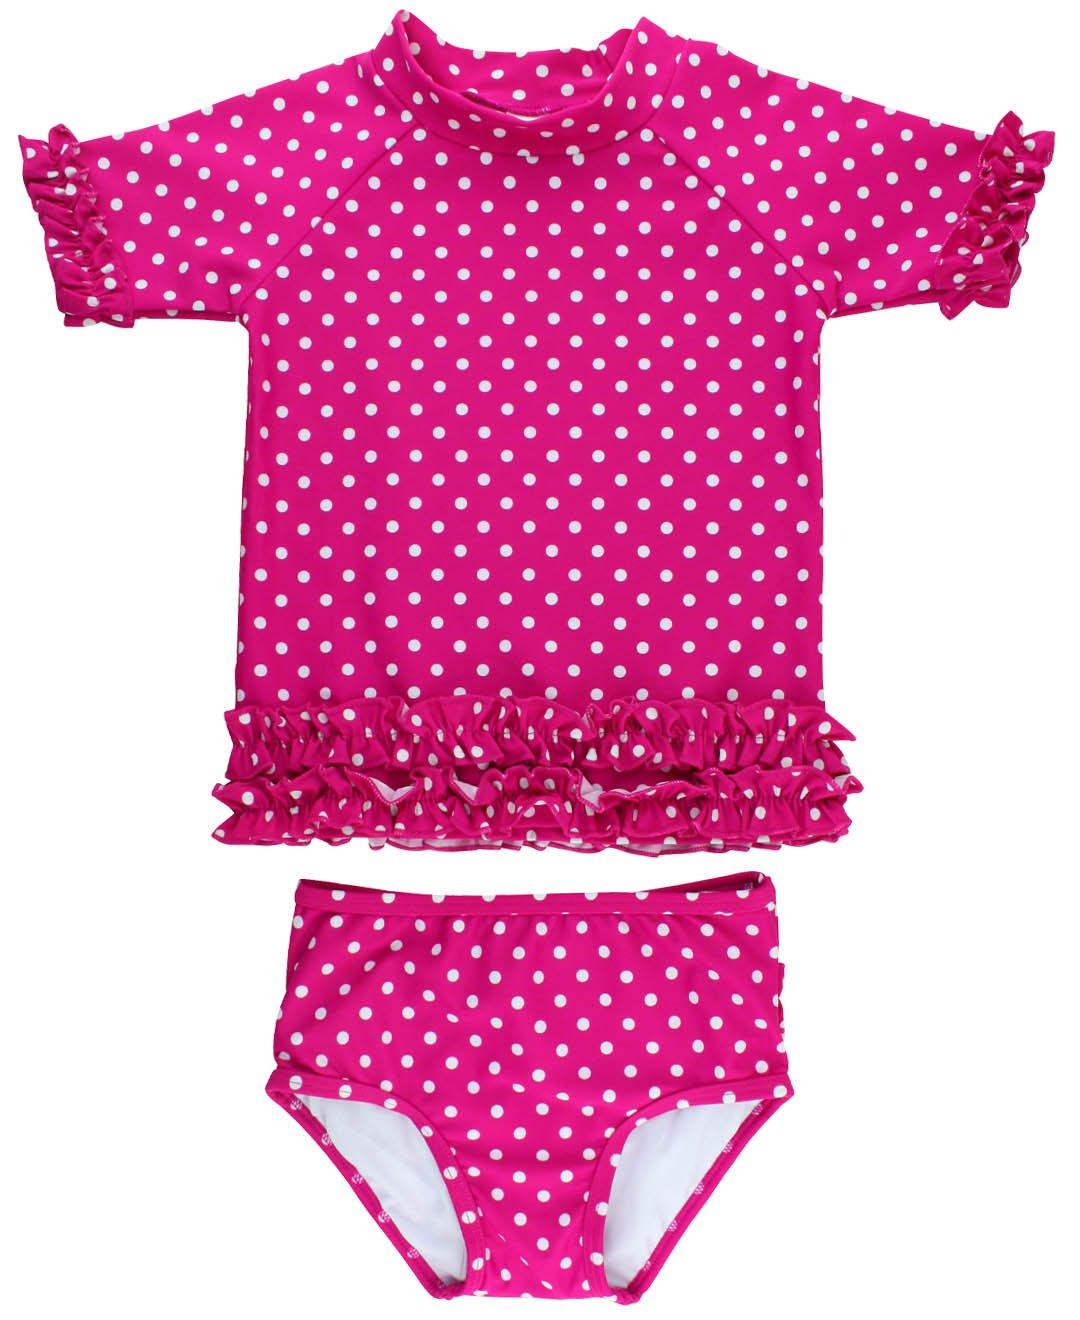 RuffleButts Little Girls Rash Guard 2-Piece Swimsuit Set - Berry Polka Dot Bikini with UPF 50+ Sun Protection - 3T by RuffleButts (Image #5)